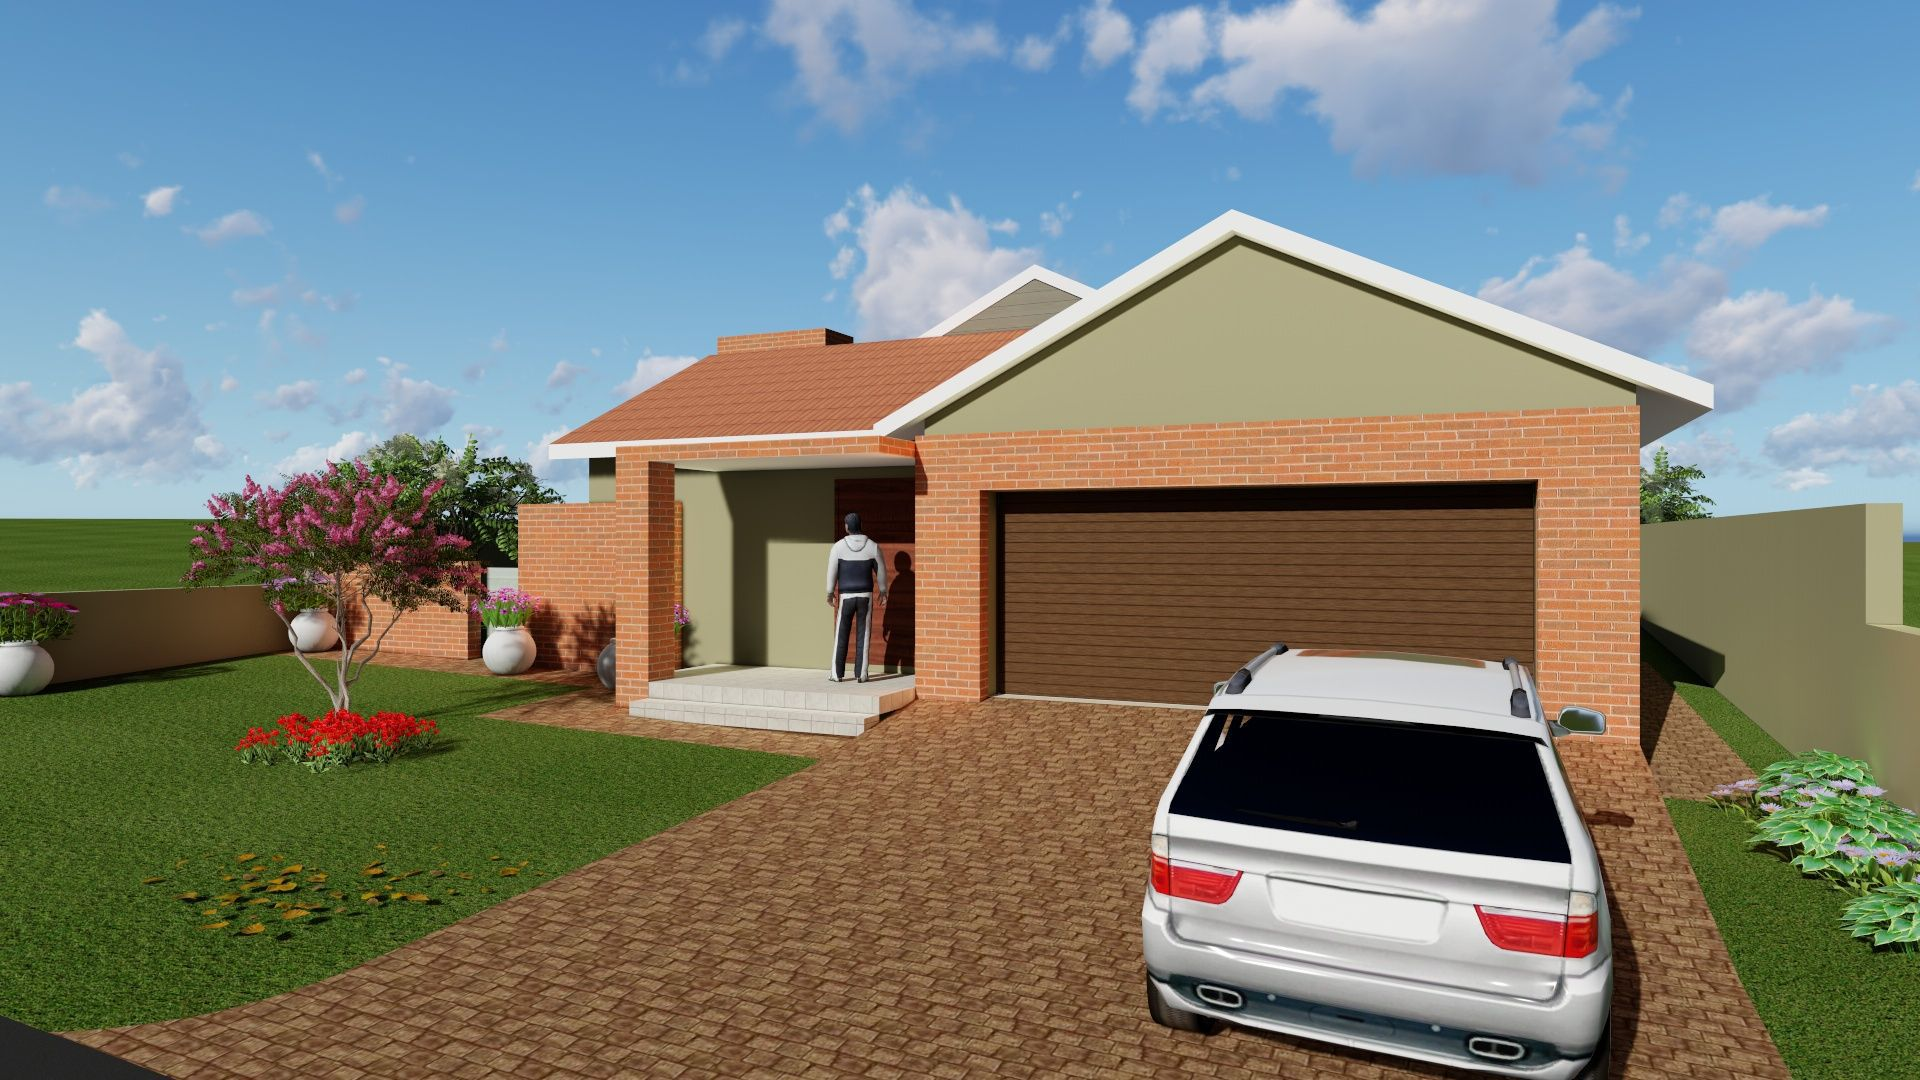 Centurion, Kosmosdal Property  | Houses For Sale Kosmosdal, KOSMOSDAL, House 3 bedrooms property for sale Price:1,850,000